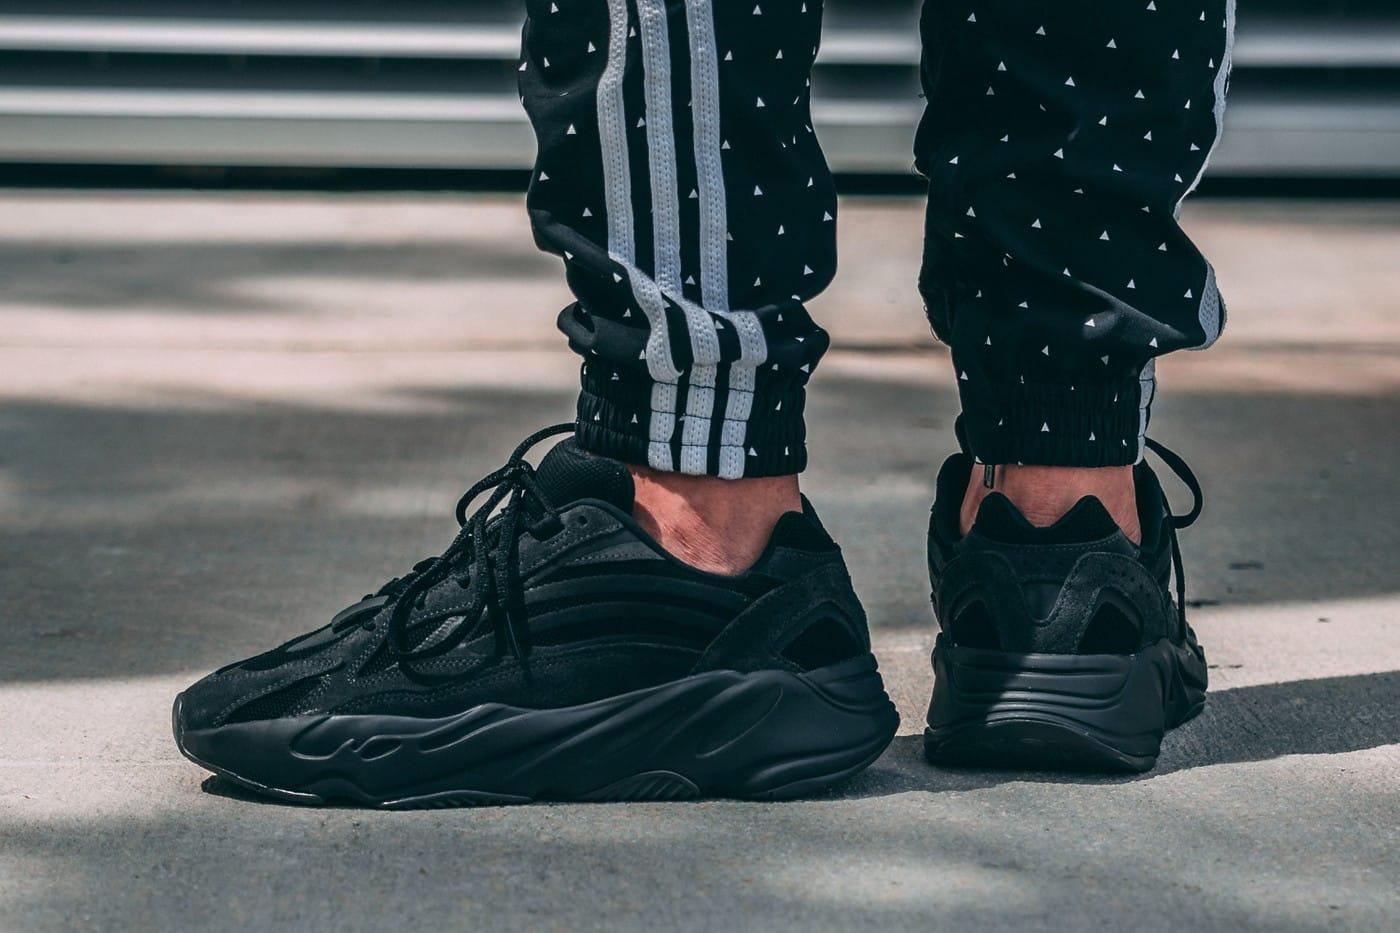 adidas yeezy boost 700 noir